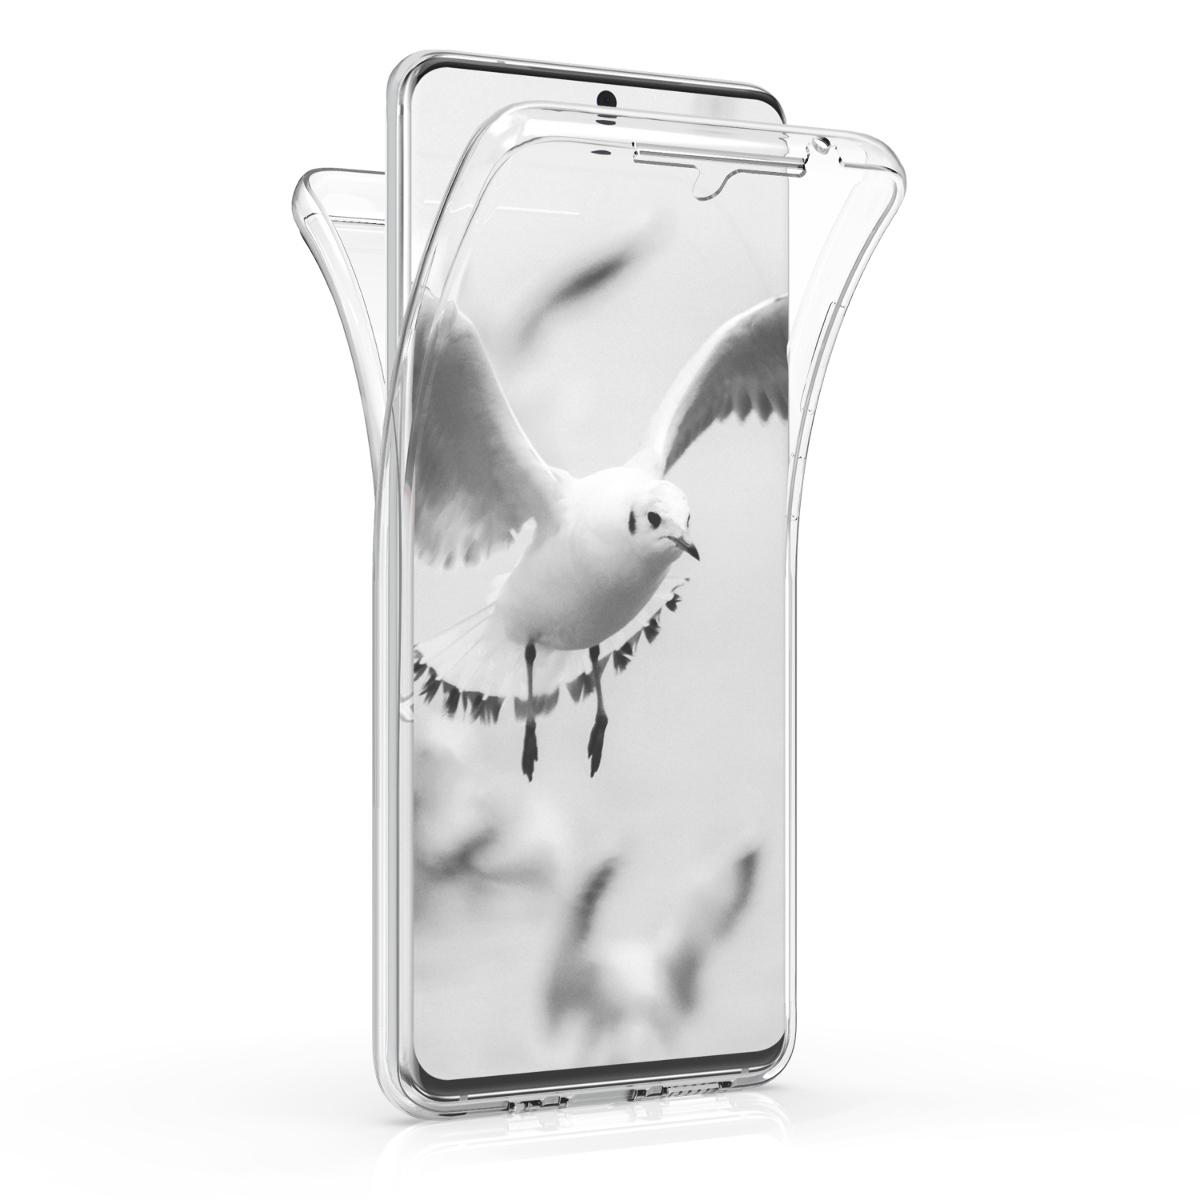 KW Θήκη Σιλικόνης Full Body Samsung Galaxy S20 Ultra - Transparent (51227.03)